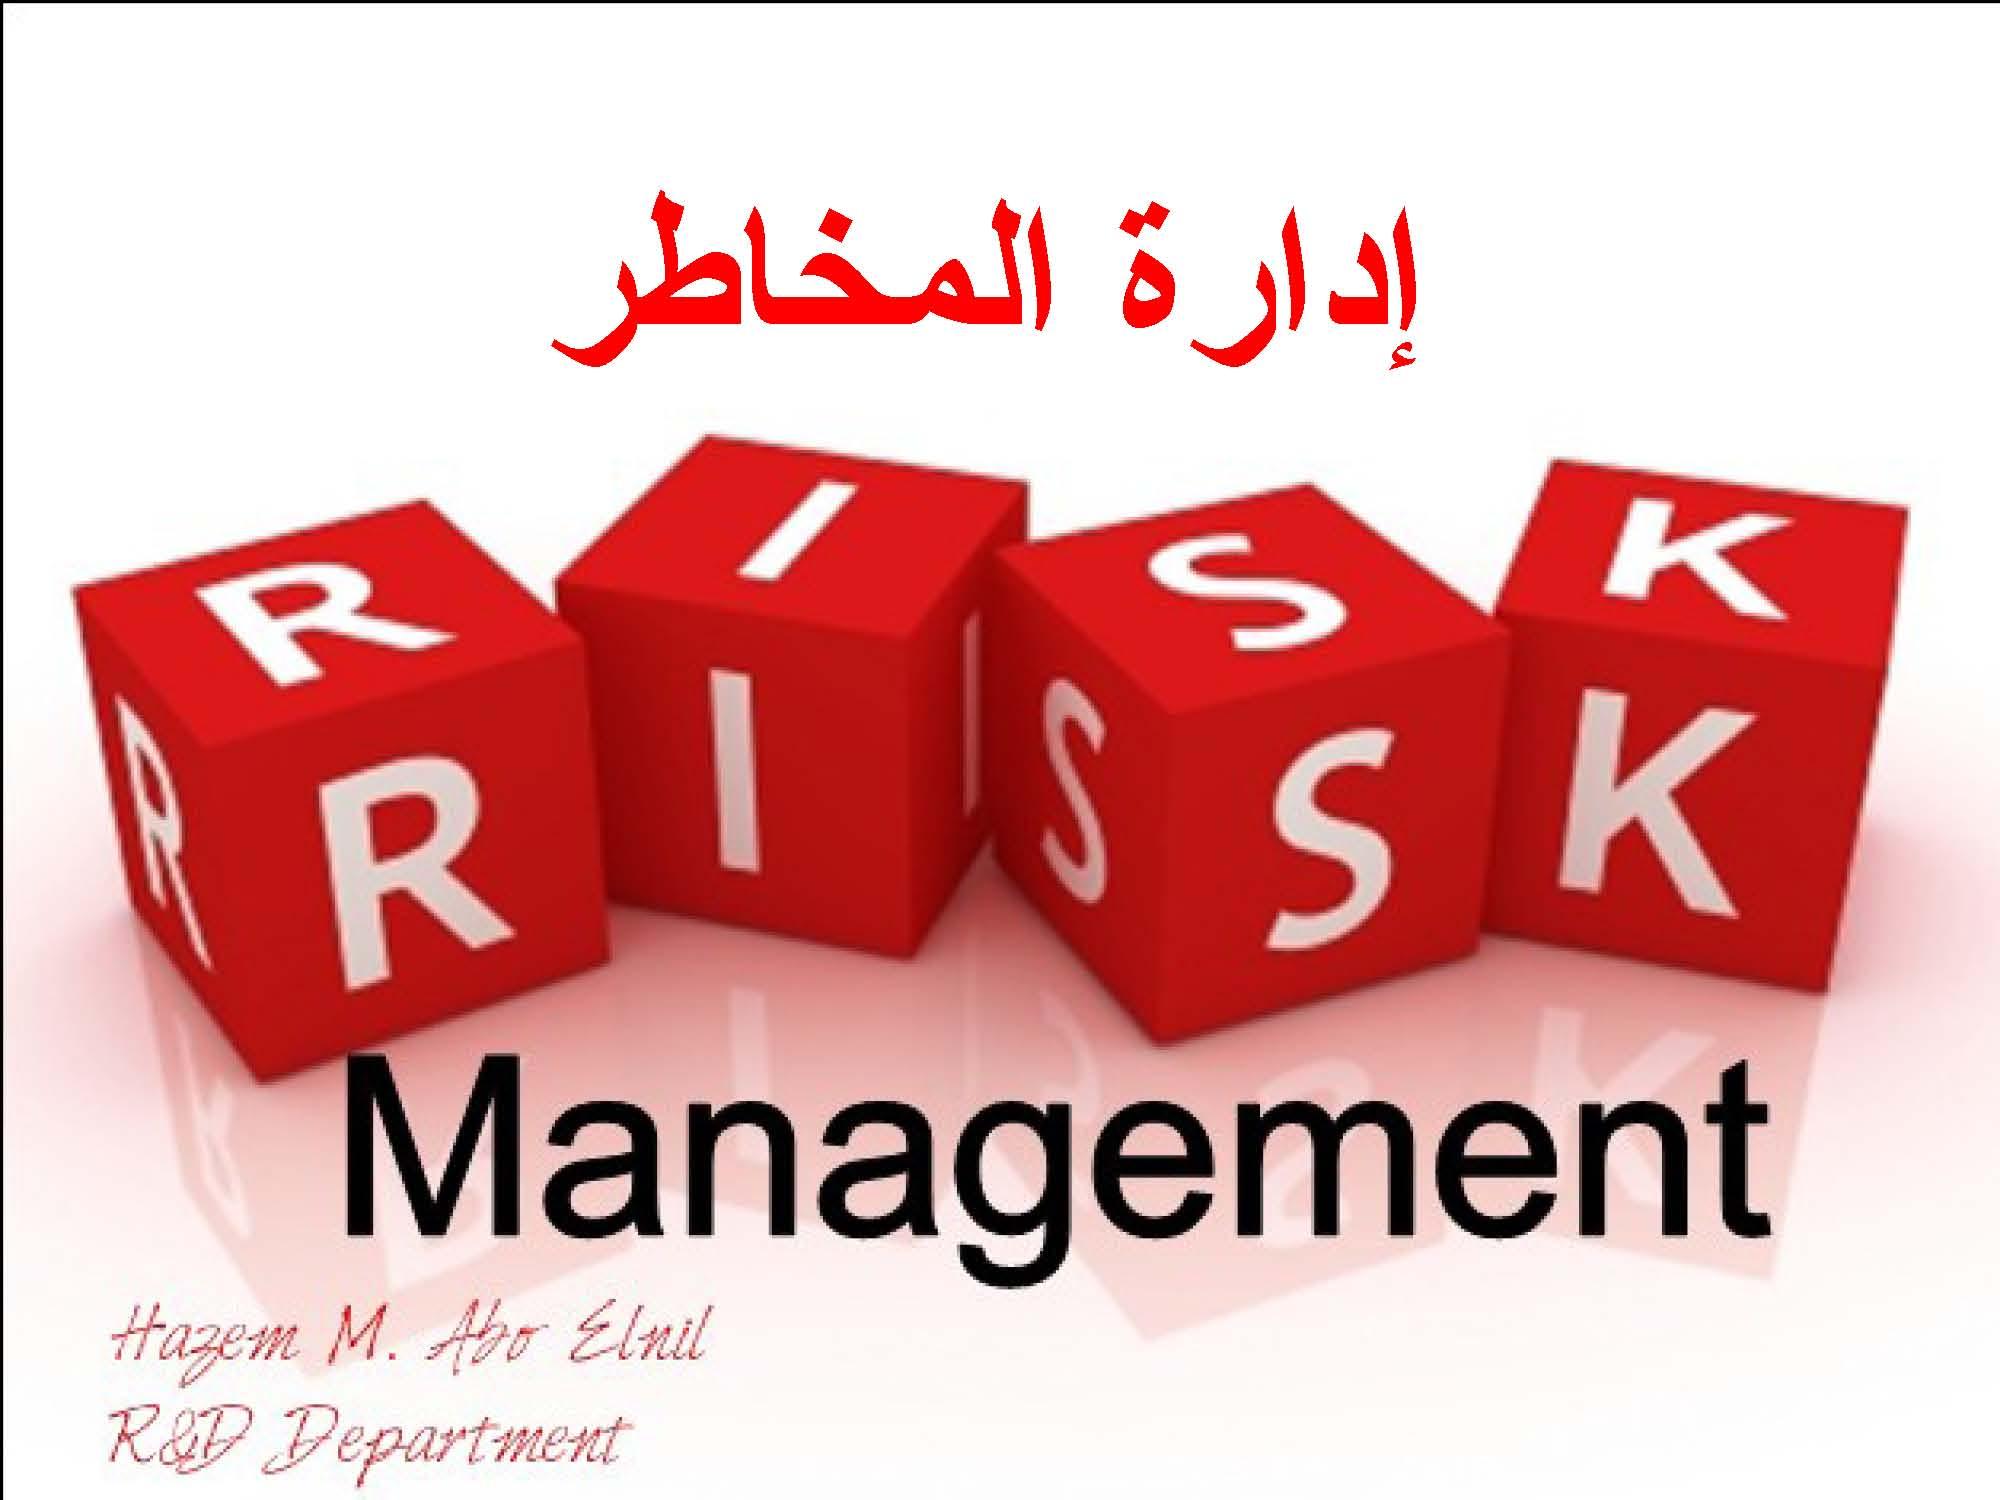 Project Risk Management PDF Guide